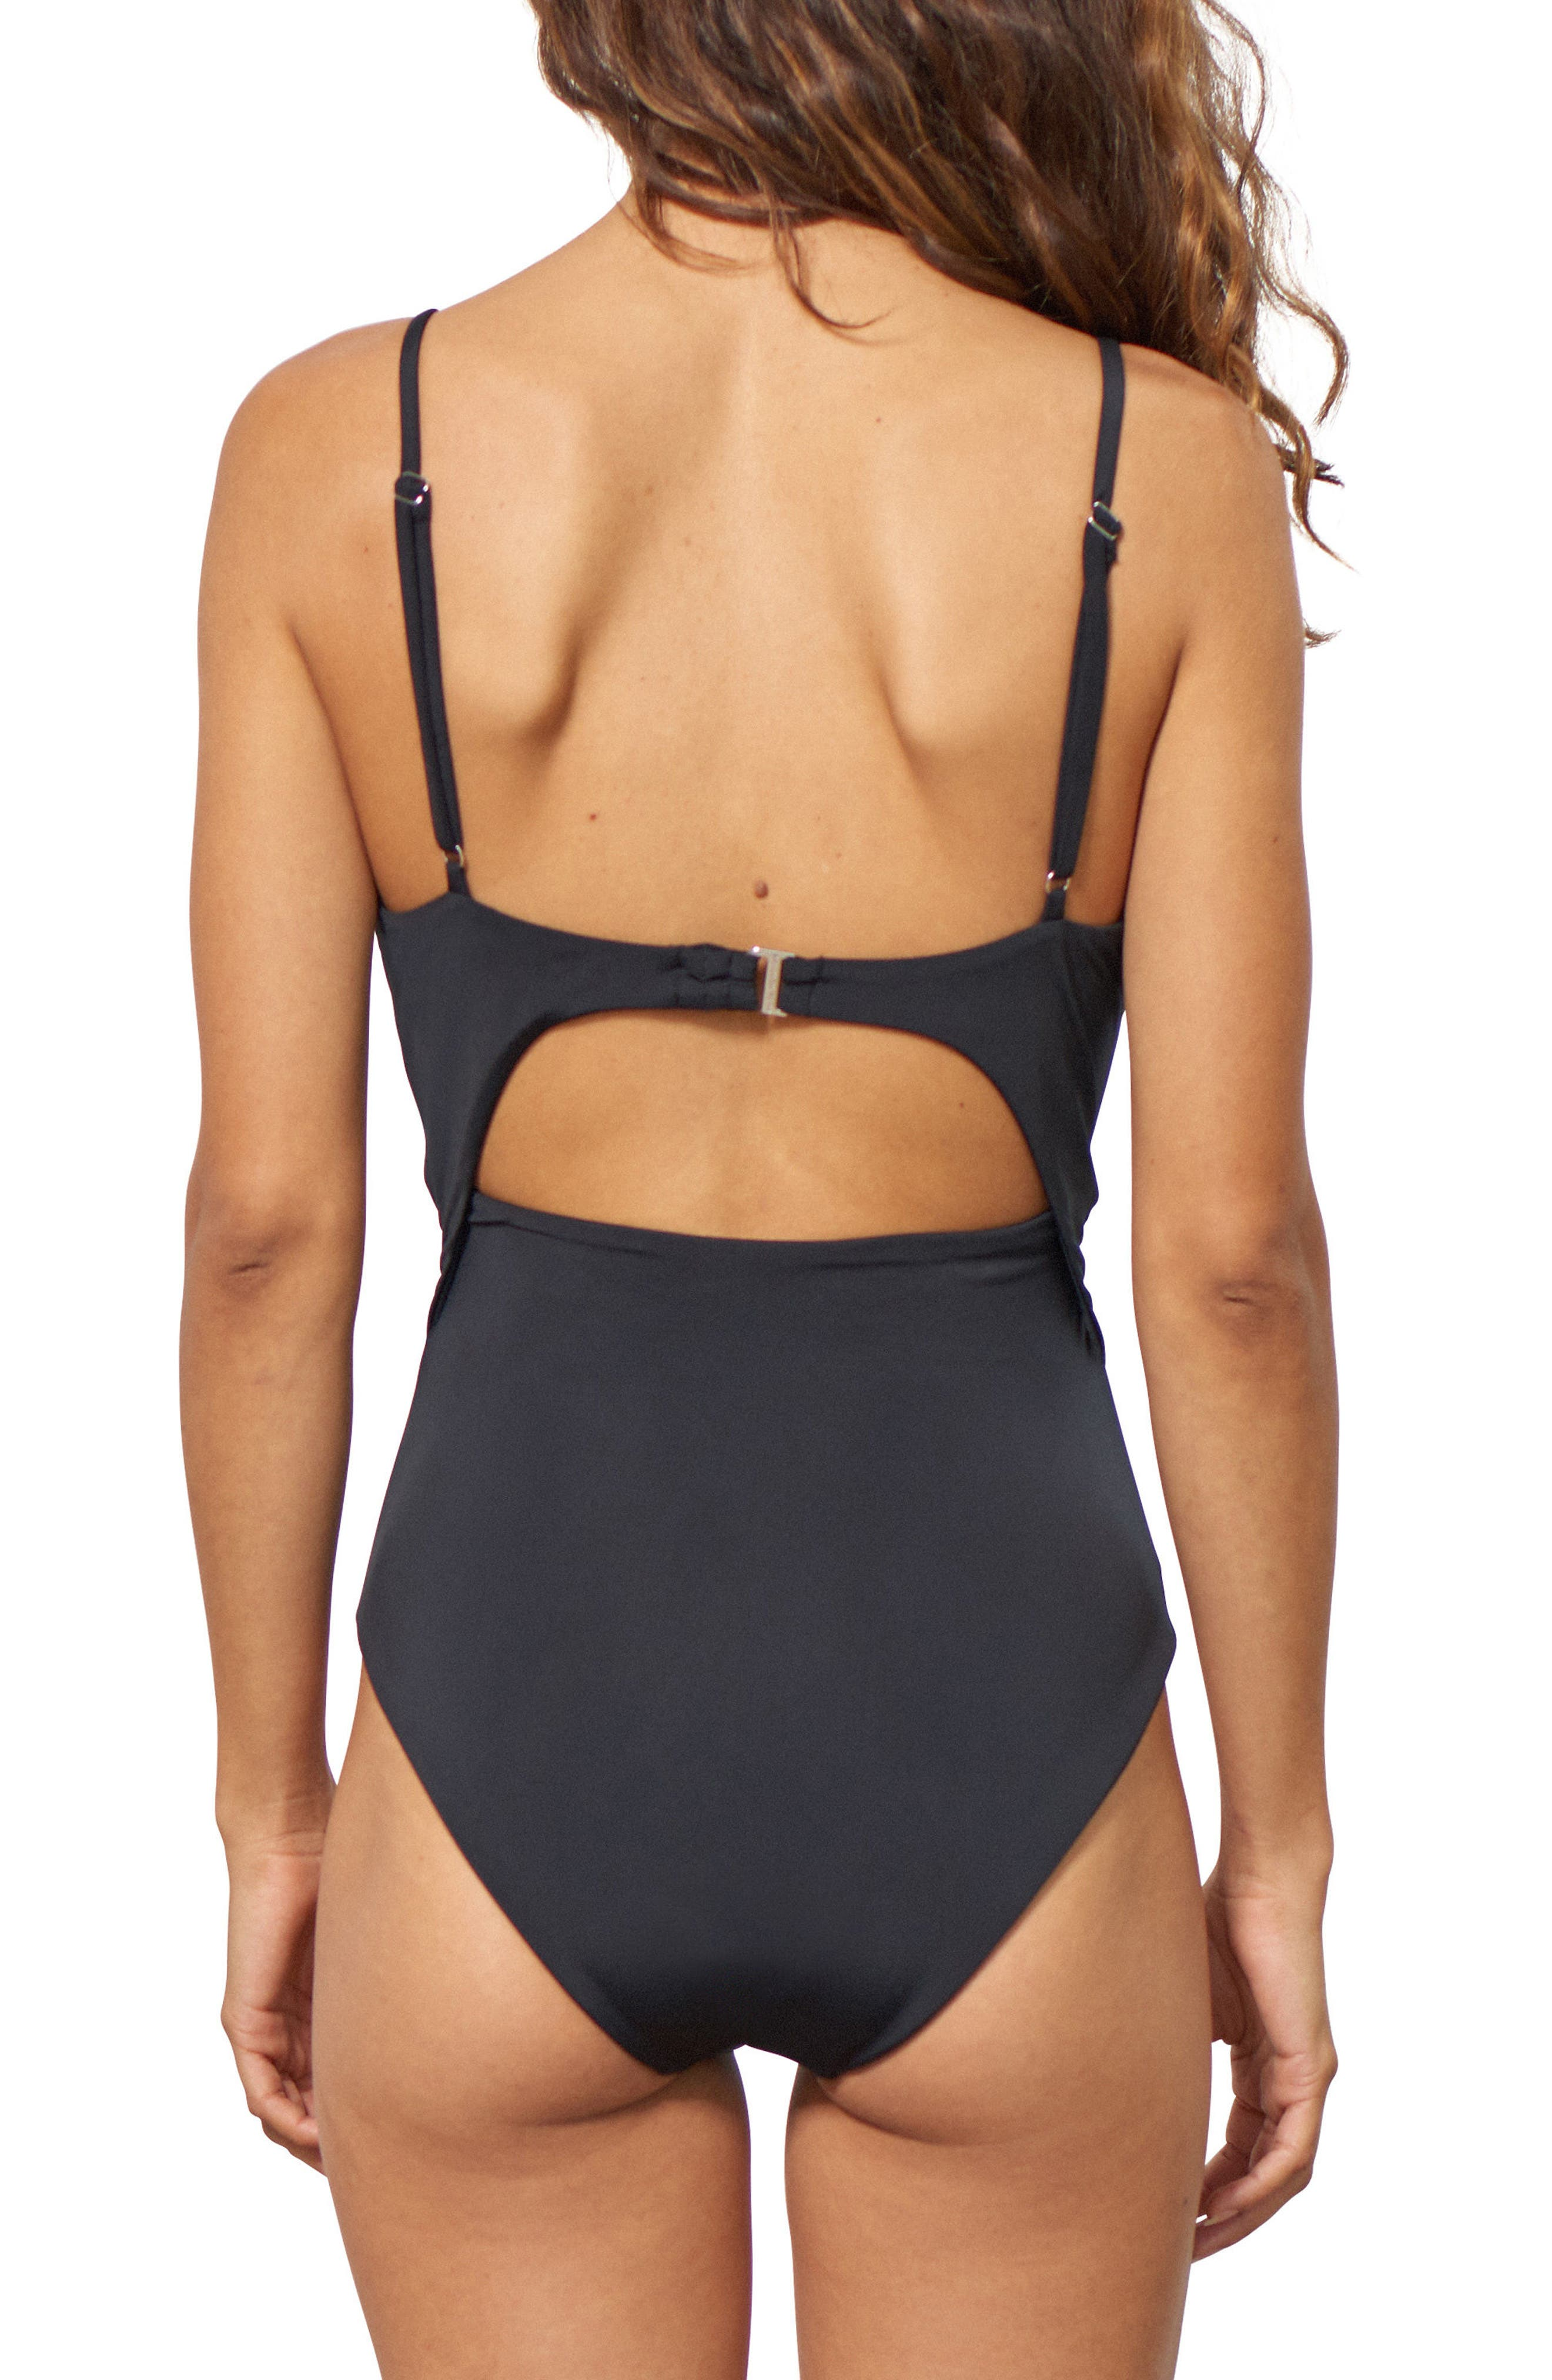 Kia Cutout One-Piece Swimsuit,                             Alternate thumbnail 2, color,                             Black